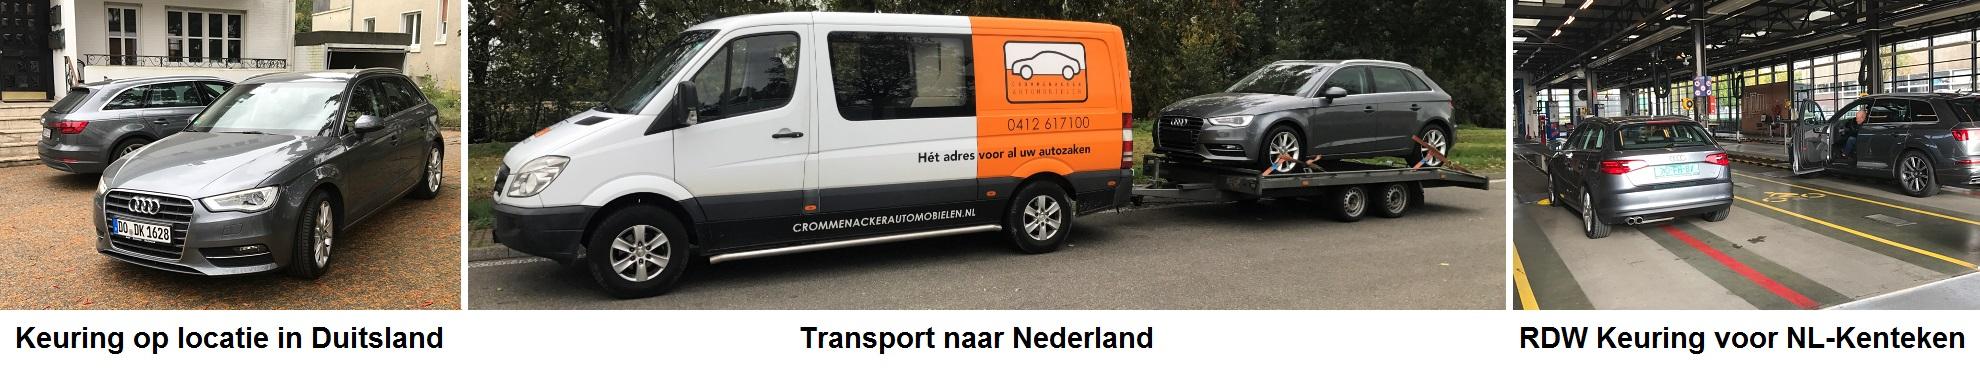 Import Auto Importeren